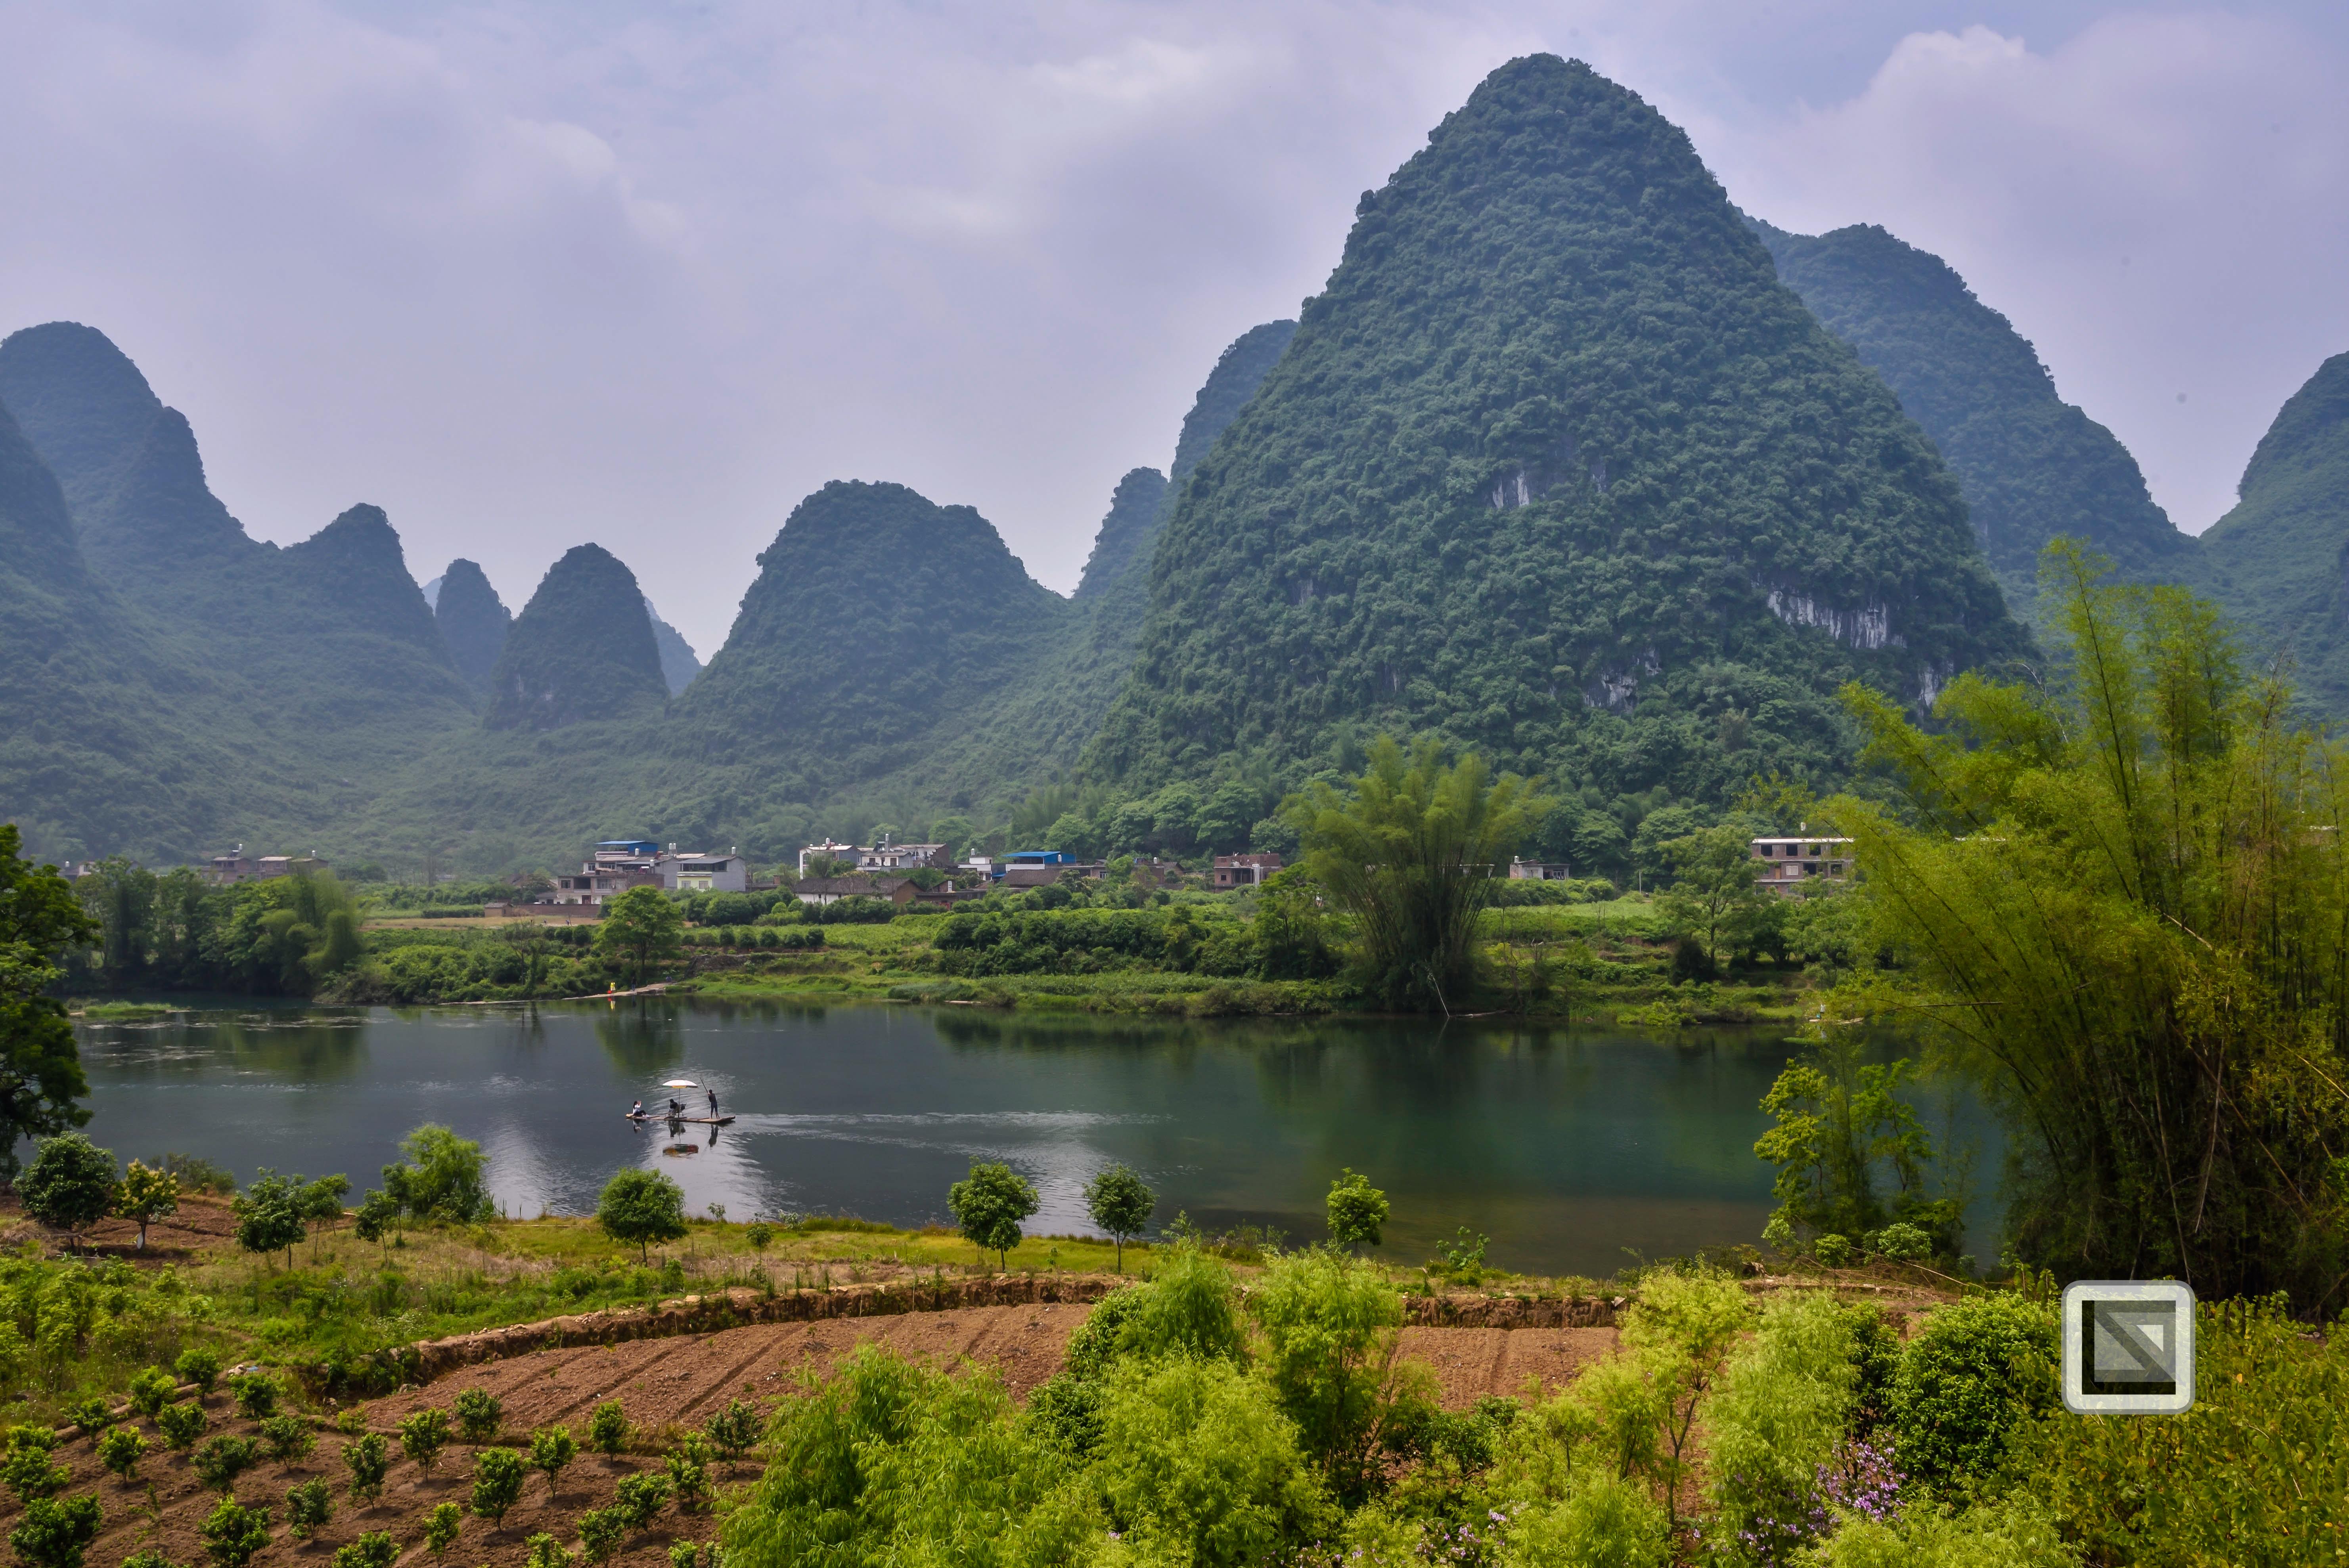 HQ Guanxi Zhuang Wallpapers | File 7197.69Kb